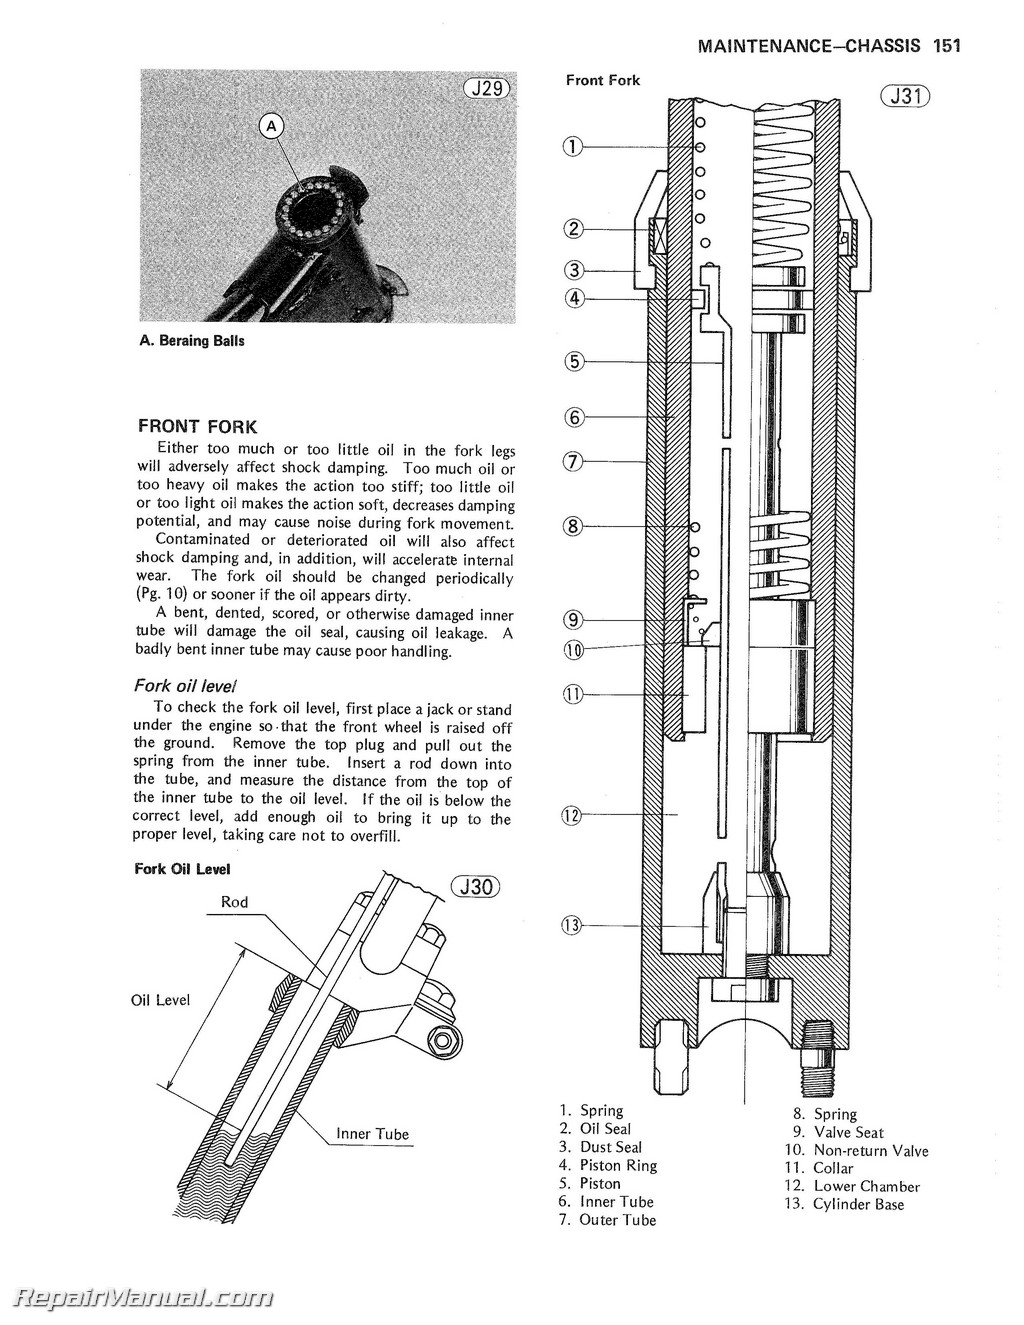 kawasaki klf300 wiring diagram kawasaki z250 wiring diagram 1979-1982 z250 1981-1983 kz305 1983 ex305 1983 er250 ...